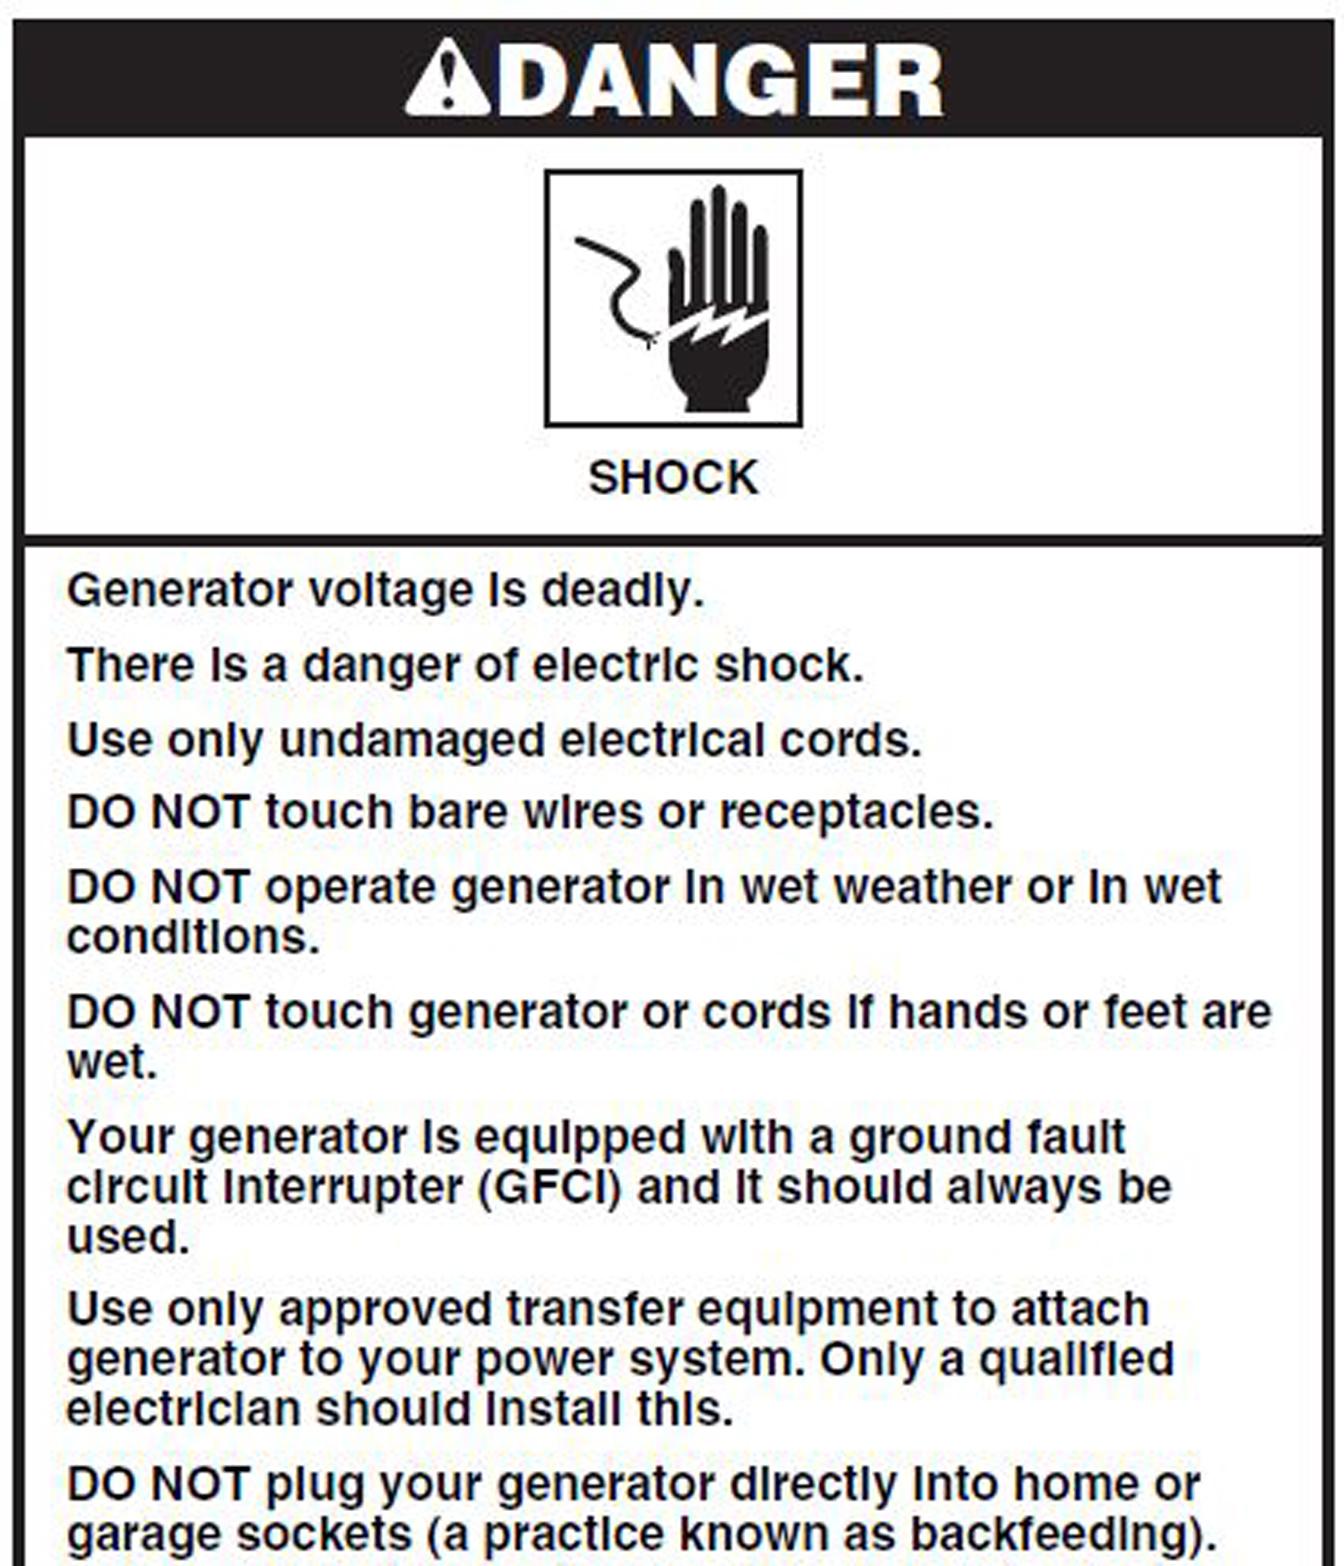 North American Clean Energy Portable Generator Usage